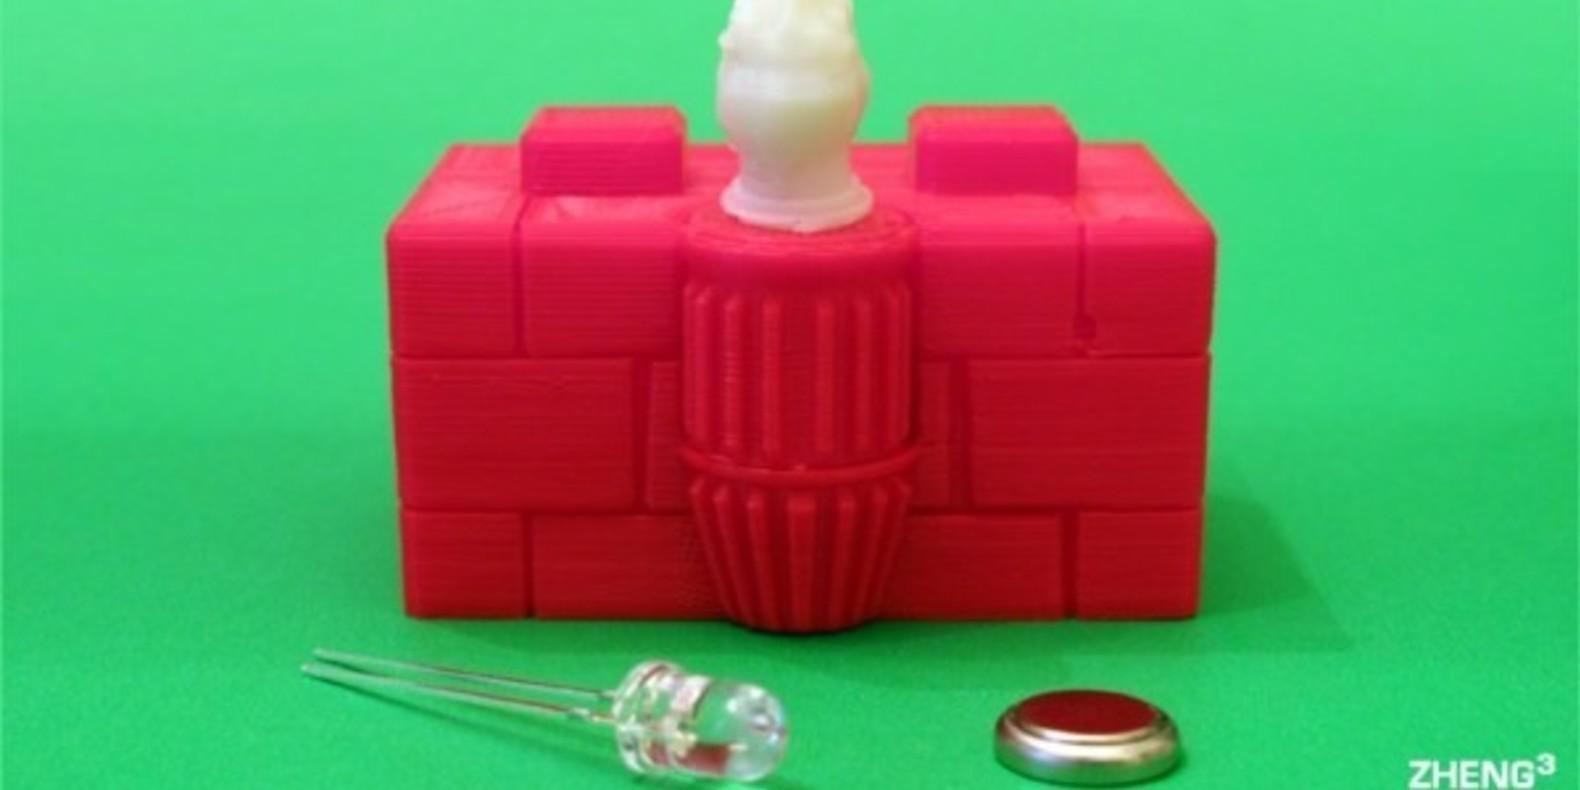 http://fichier3d.fr/wp-content/uploads/2014/01/zheng3-seej-the-forge-fichier-3d-cults-jeu-plateau-catapulte-arme-weapon-block-impression-3d-3D-printing-fun-games-7-e1389265492397.jpg